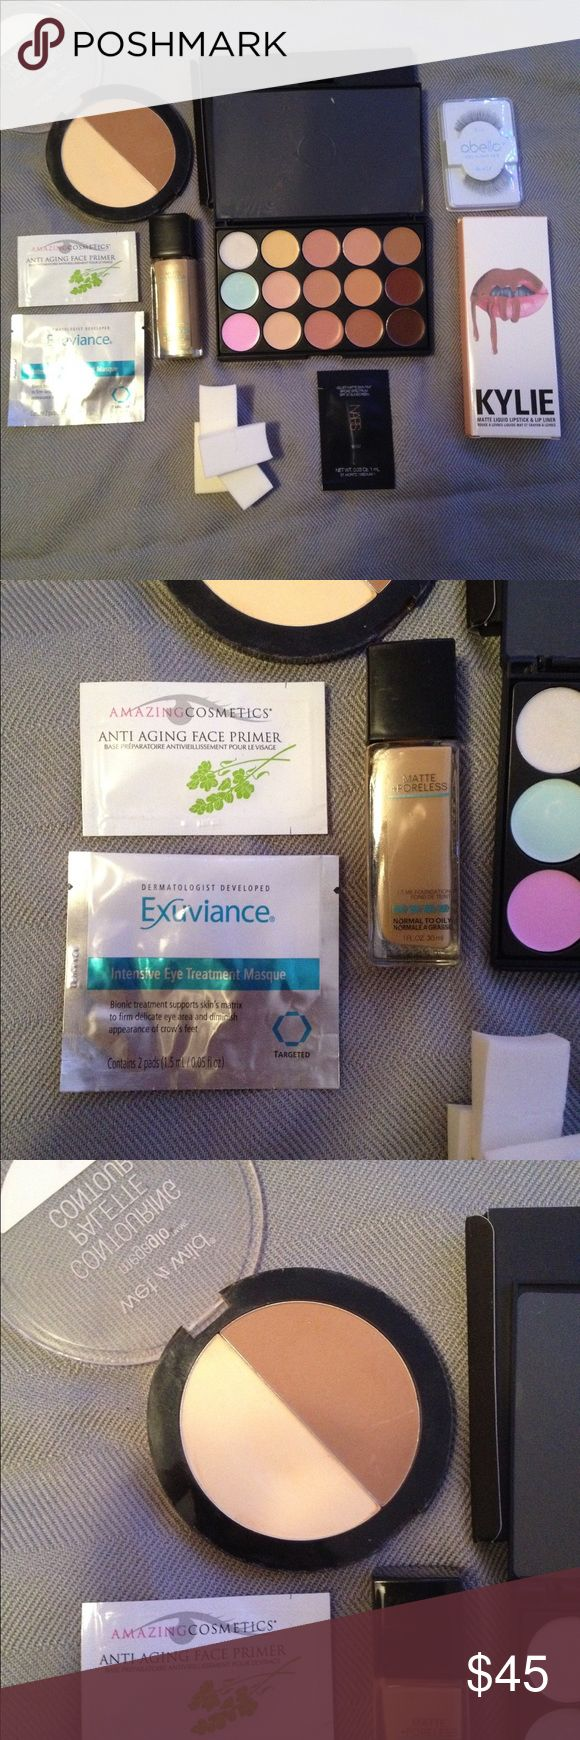 Bundle of Makeup INCLUDES:  Maybelline Matte + Poreless Foundation: 332 Golden Caramel, retails $7.99 Wet n Wild Megaglo Contour Palette: 750A Caramel Toffee, retails $4 Highlight, Contour, and Color Correcting Palette, $18 Kylie Lip Kit: Maliboo, retails $29 Abella Lashes: #12 Black, retails $3 Nars All Day Luminous Weightless Foundation: Santa Fe, $5 Nars Velvet Matte Skin Tint: St. Moritz, $5 Exuviance Intensive Eye Treatment, $5 Amazing Cosmetics Anti Aging Face Primer, $5 4 Blending…